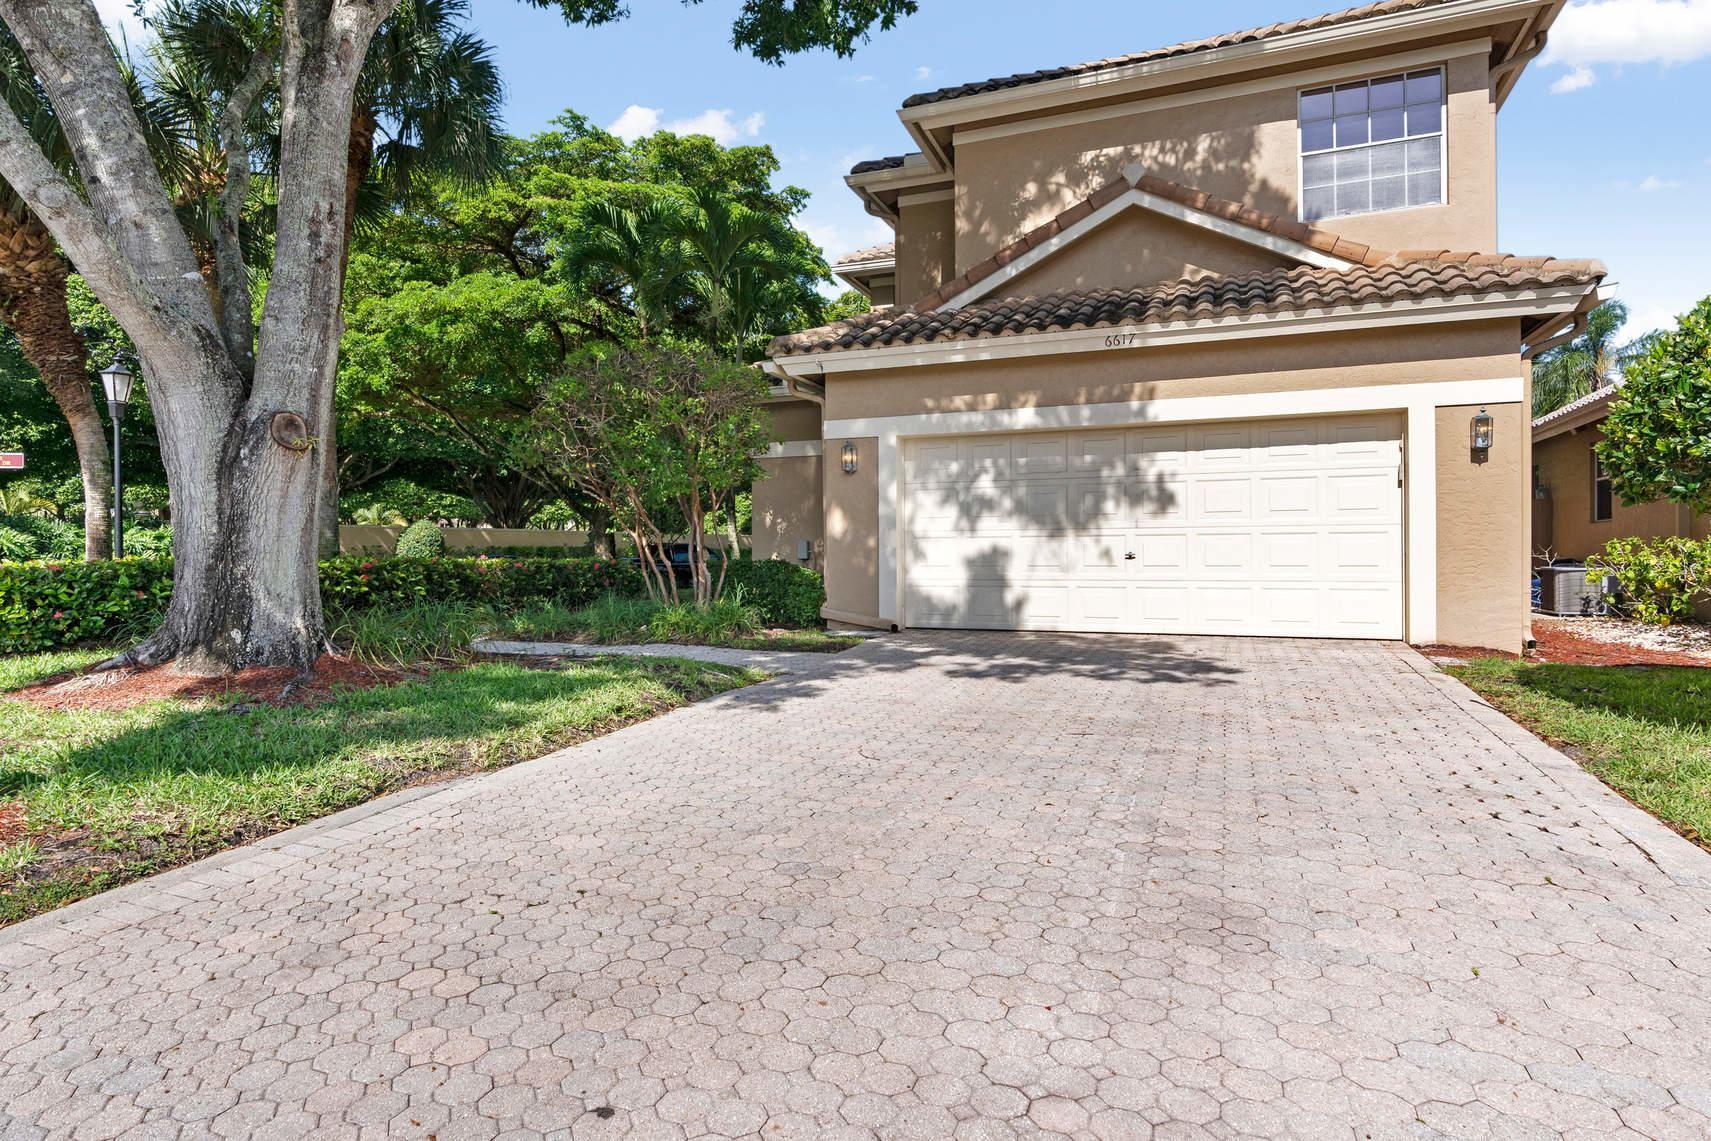 6617 NW 25th Terrace, Boca Raton, FL 33496 - #: RX-10733239